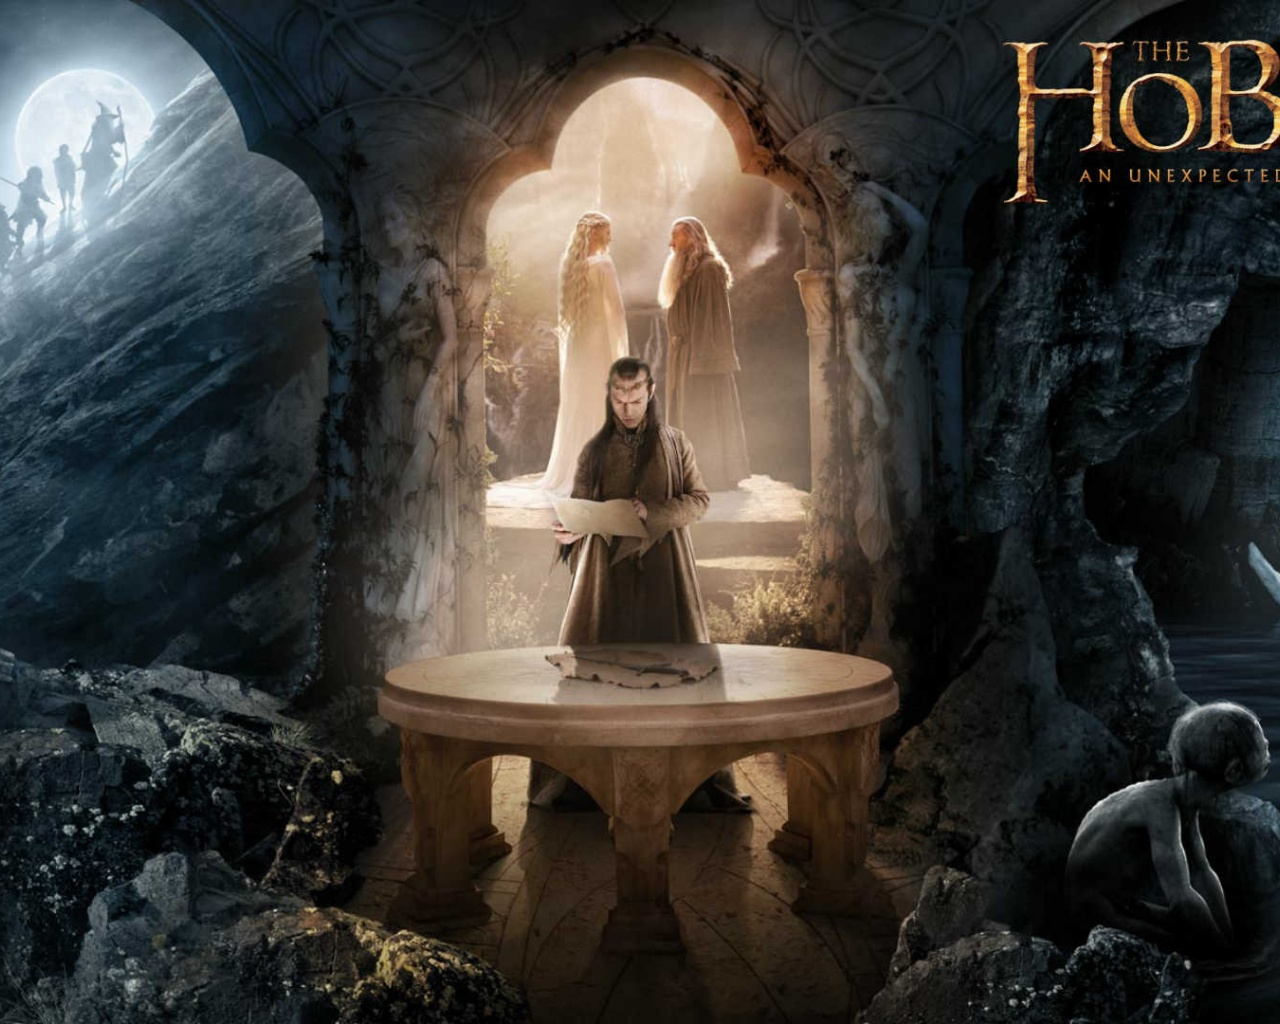 1280x1024 The Hobbit   Elrond desktop PC and Mac wallpaper 1280x1024